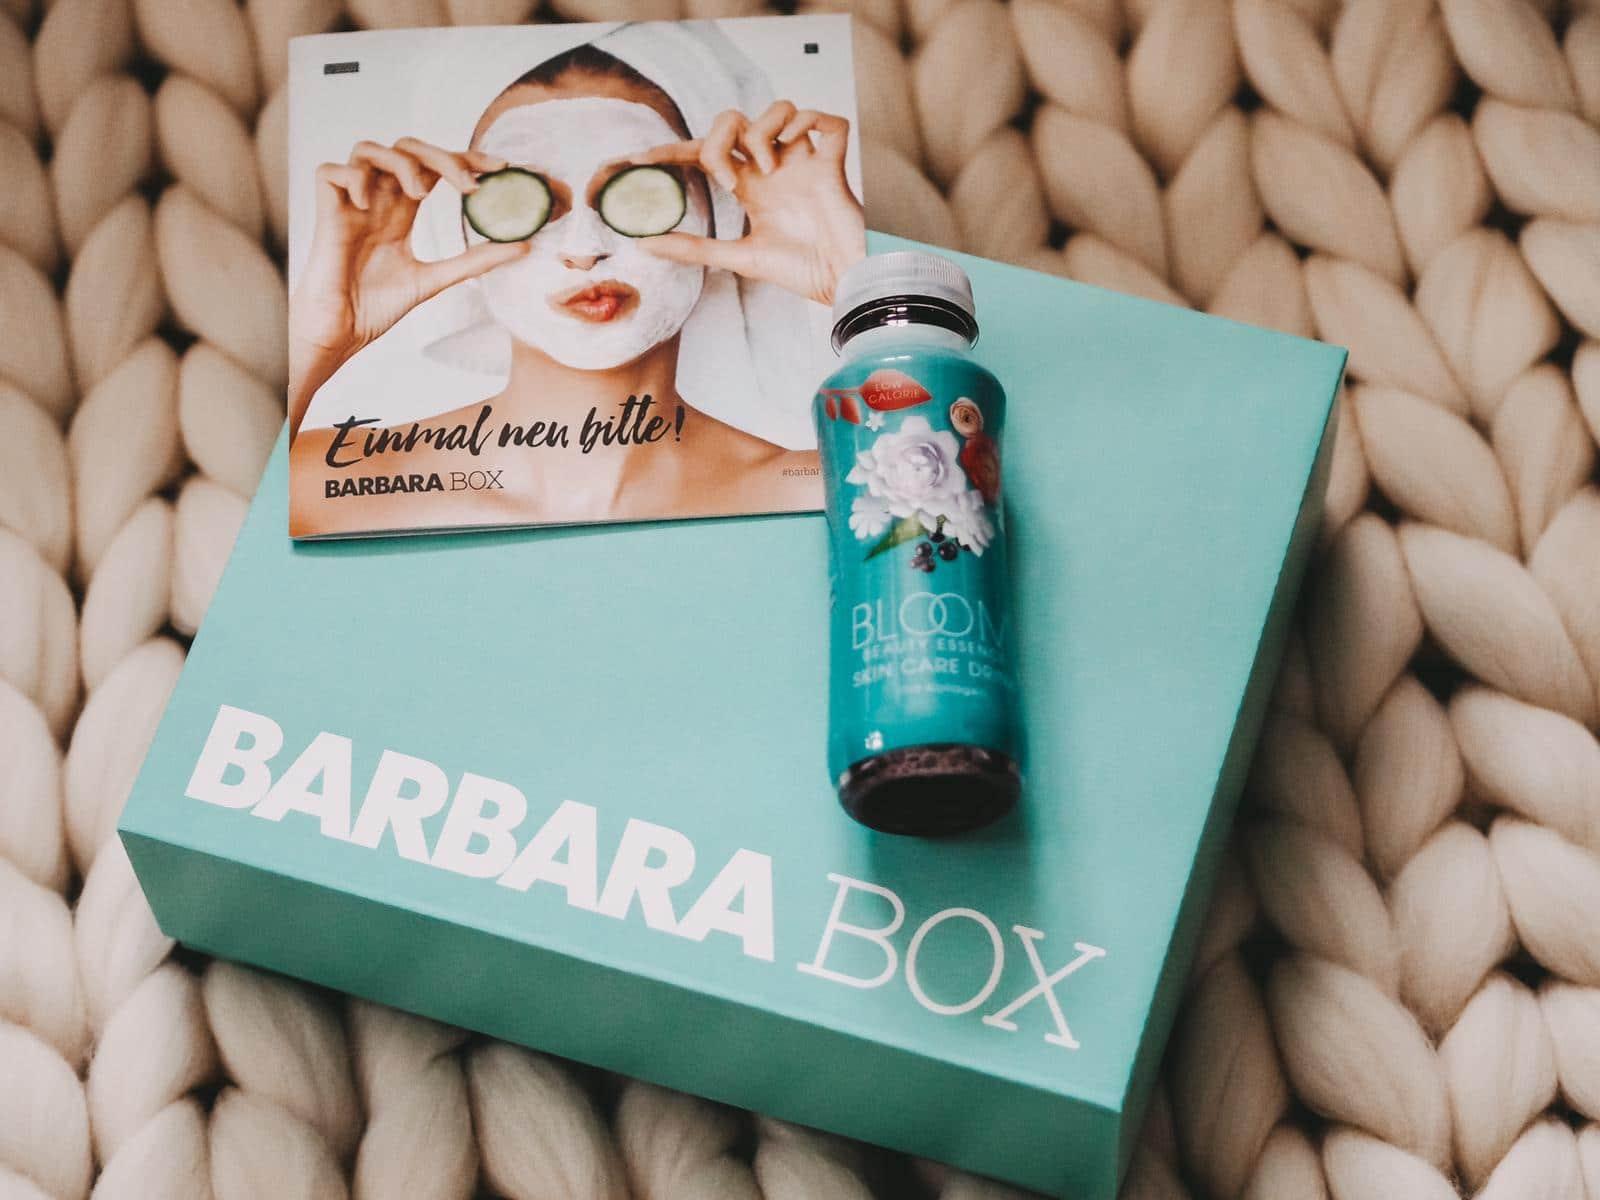 Bloom Skincare Detox Drink aus der Barbara Box Einmal neu bitte